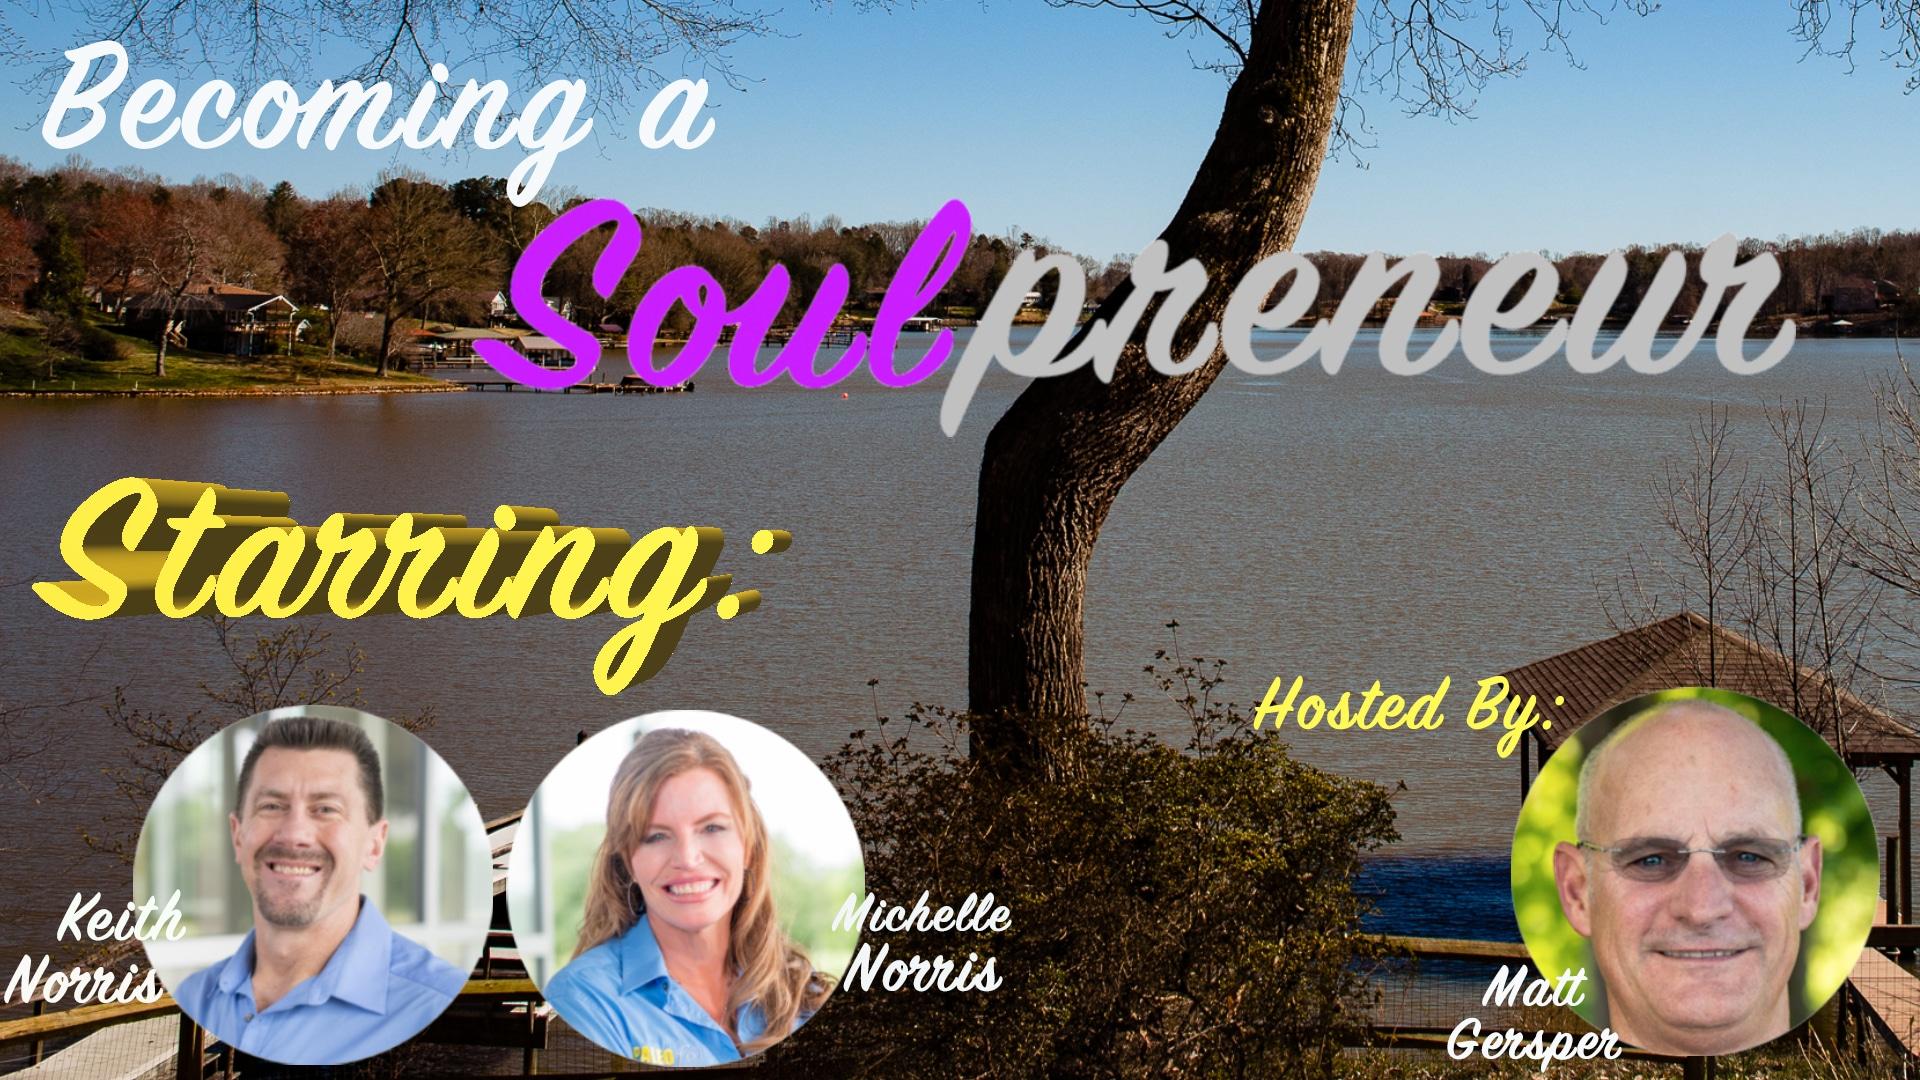 Become a Soulpreneur